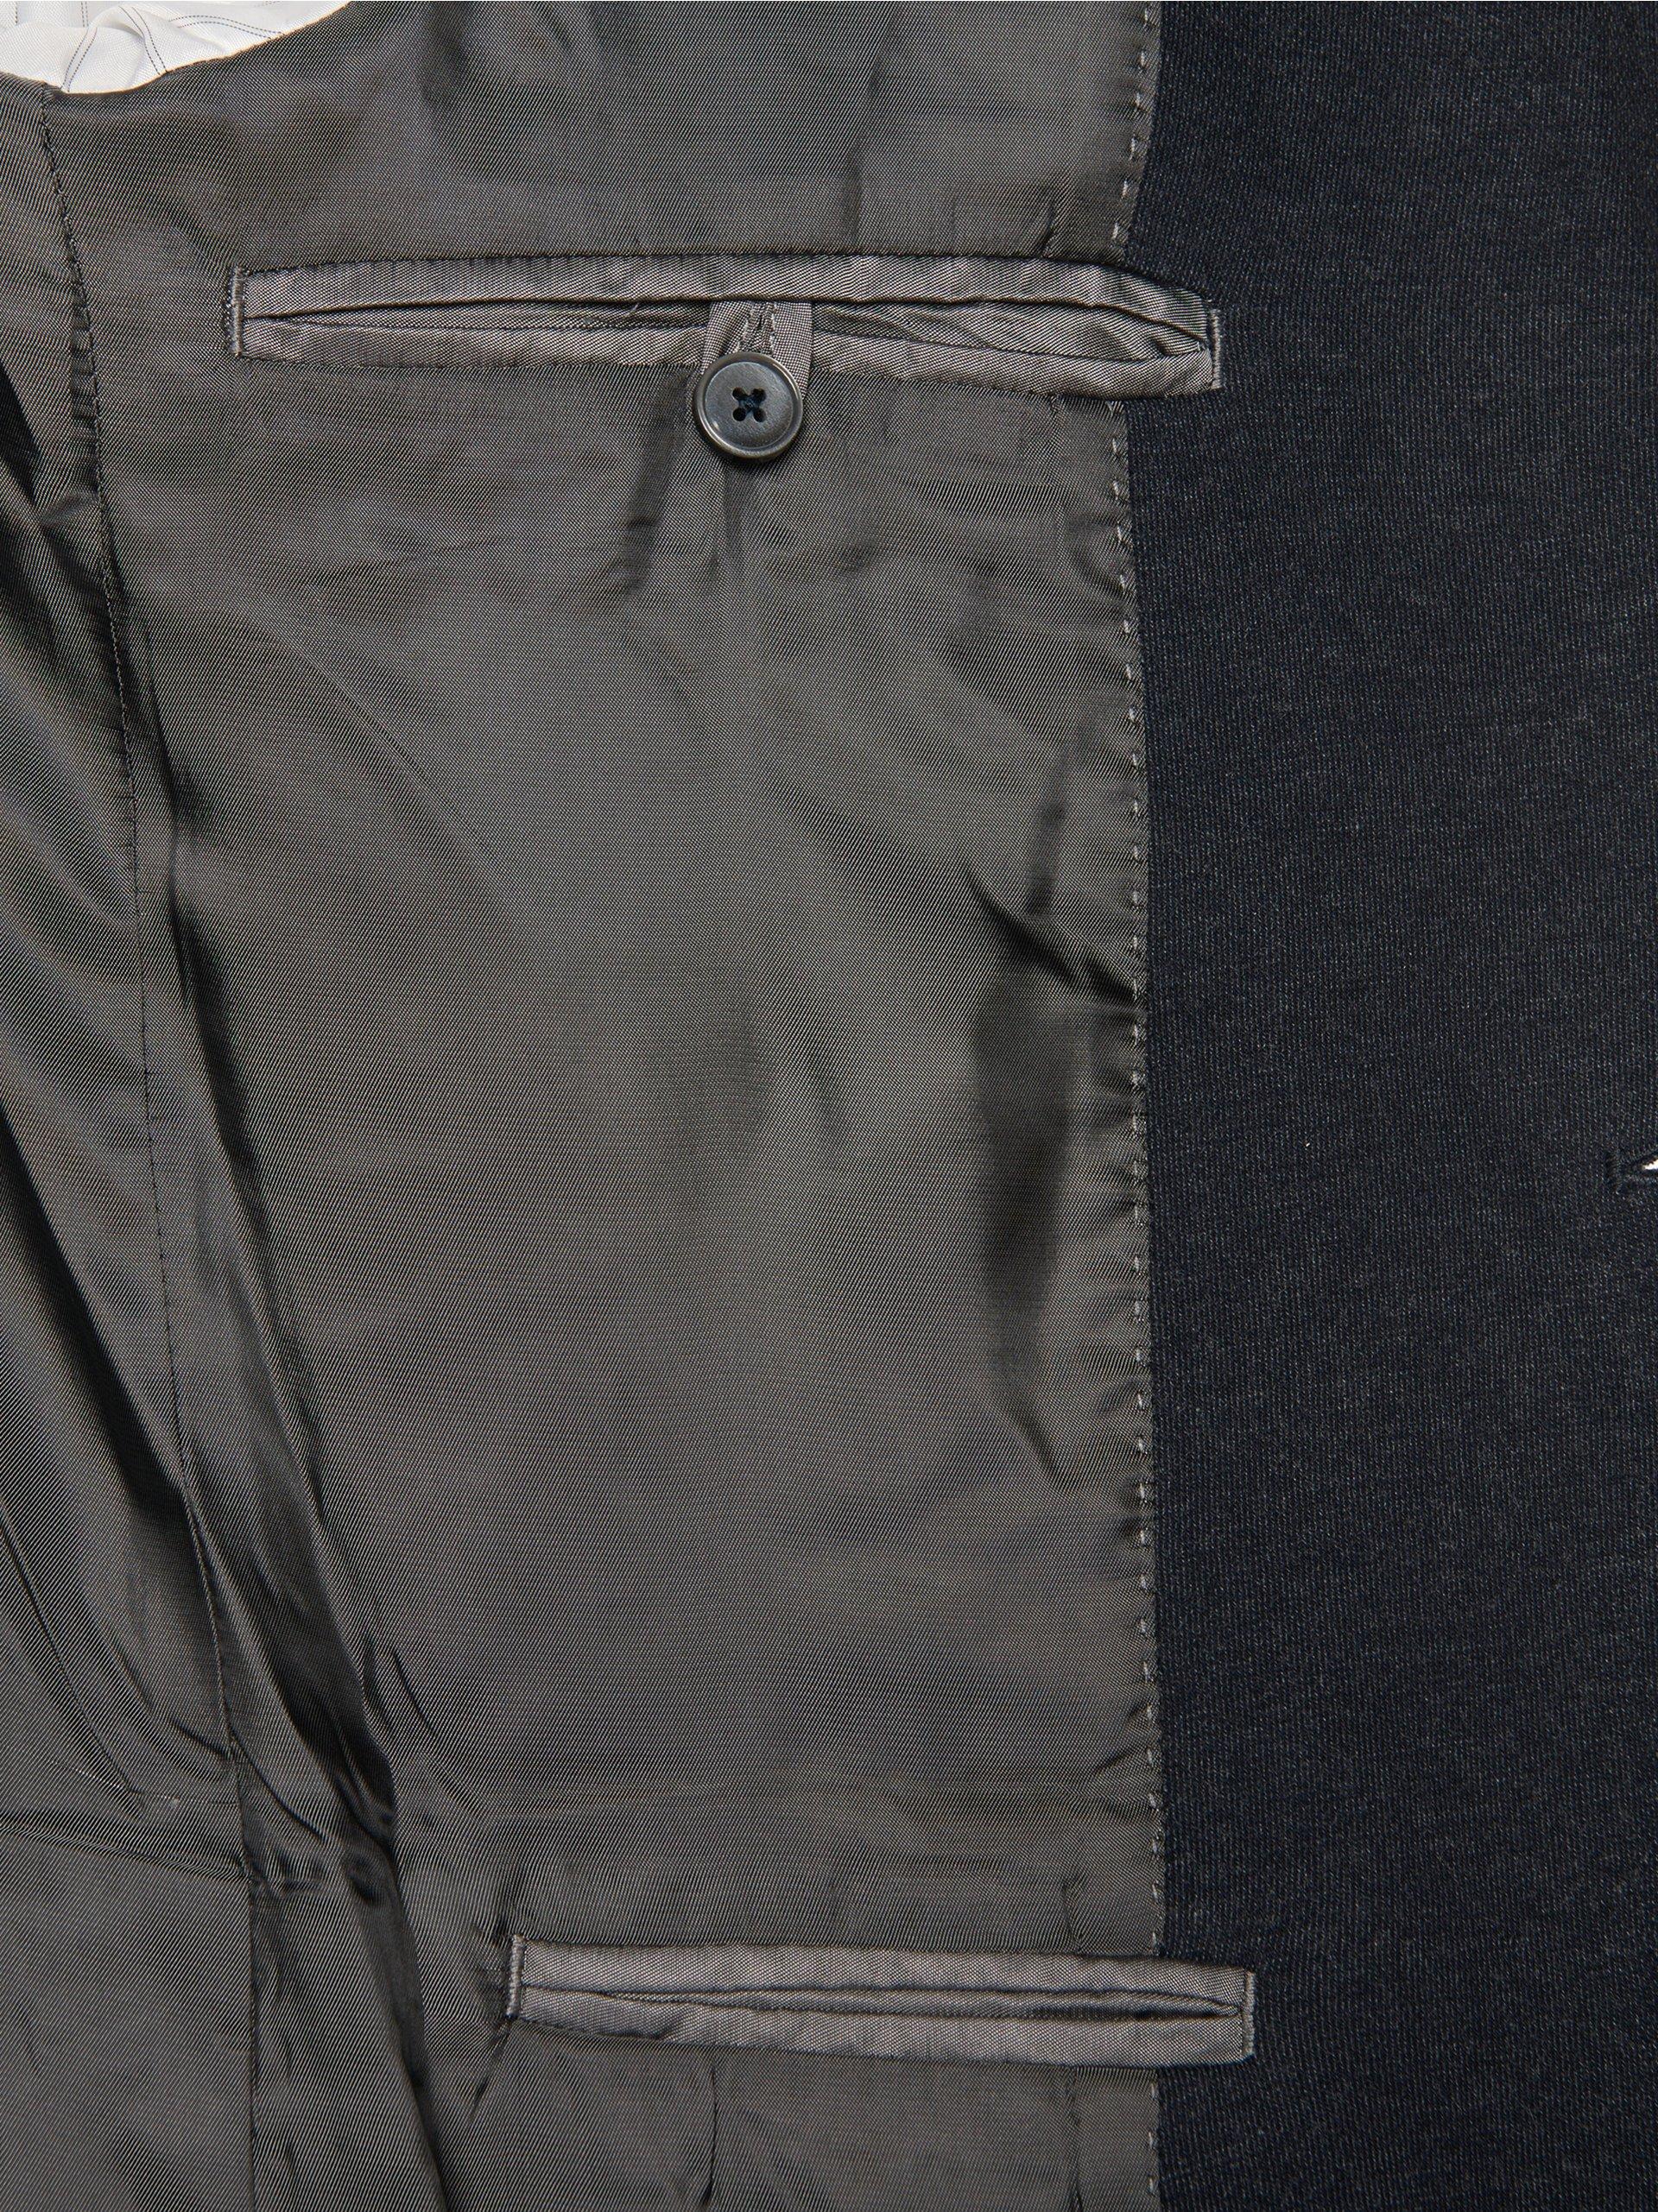 finshley harding herren jersey sakko marine uni online kaufen vangraaf com. Black Bedroom Furniture Sets. Home Design Ideas